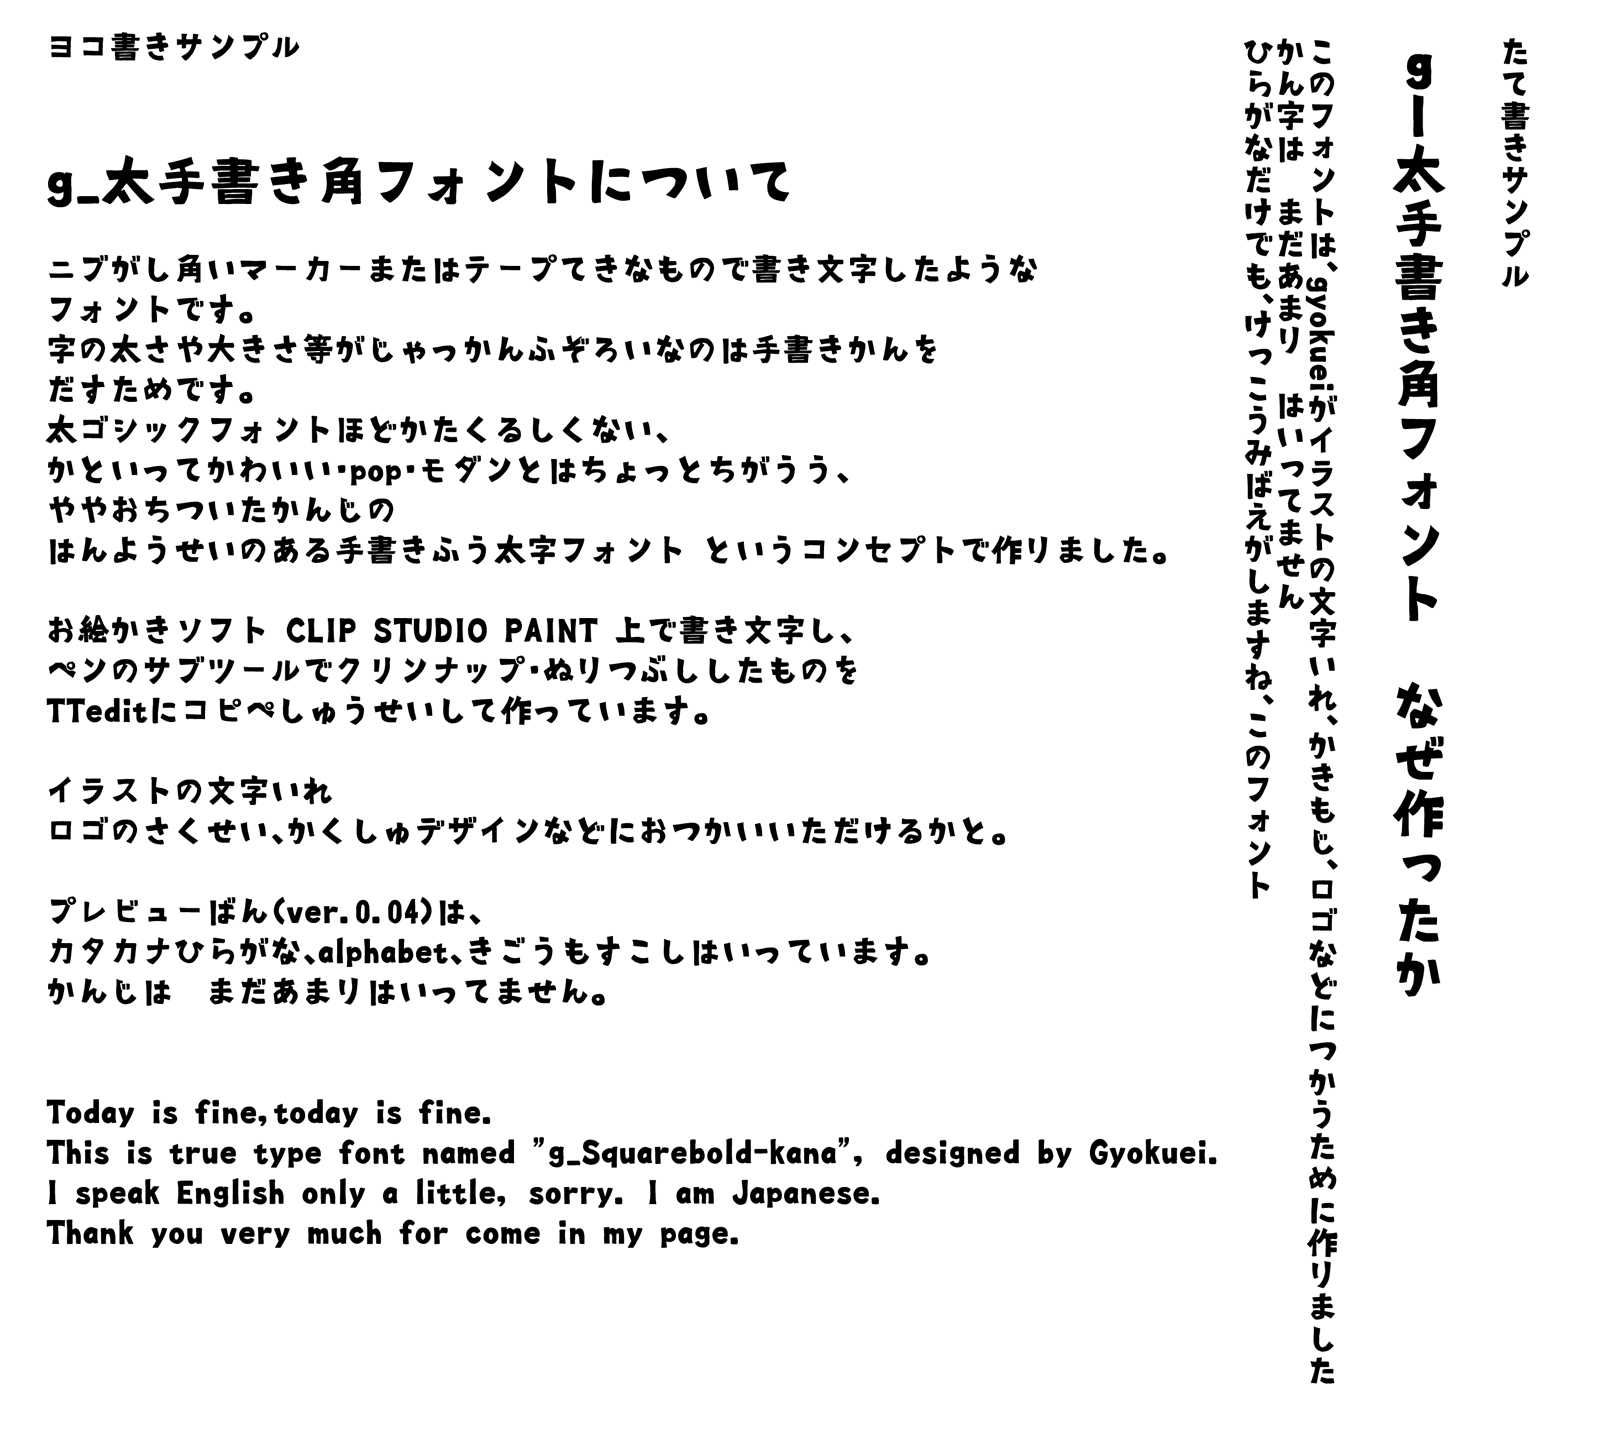 g_やぐらフォント(太手書き角)-プレビュー版 [よく訓練された素材屋]